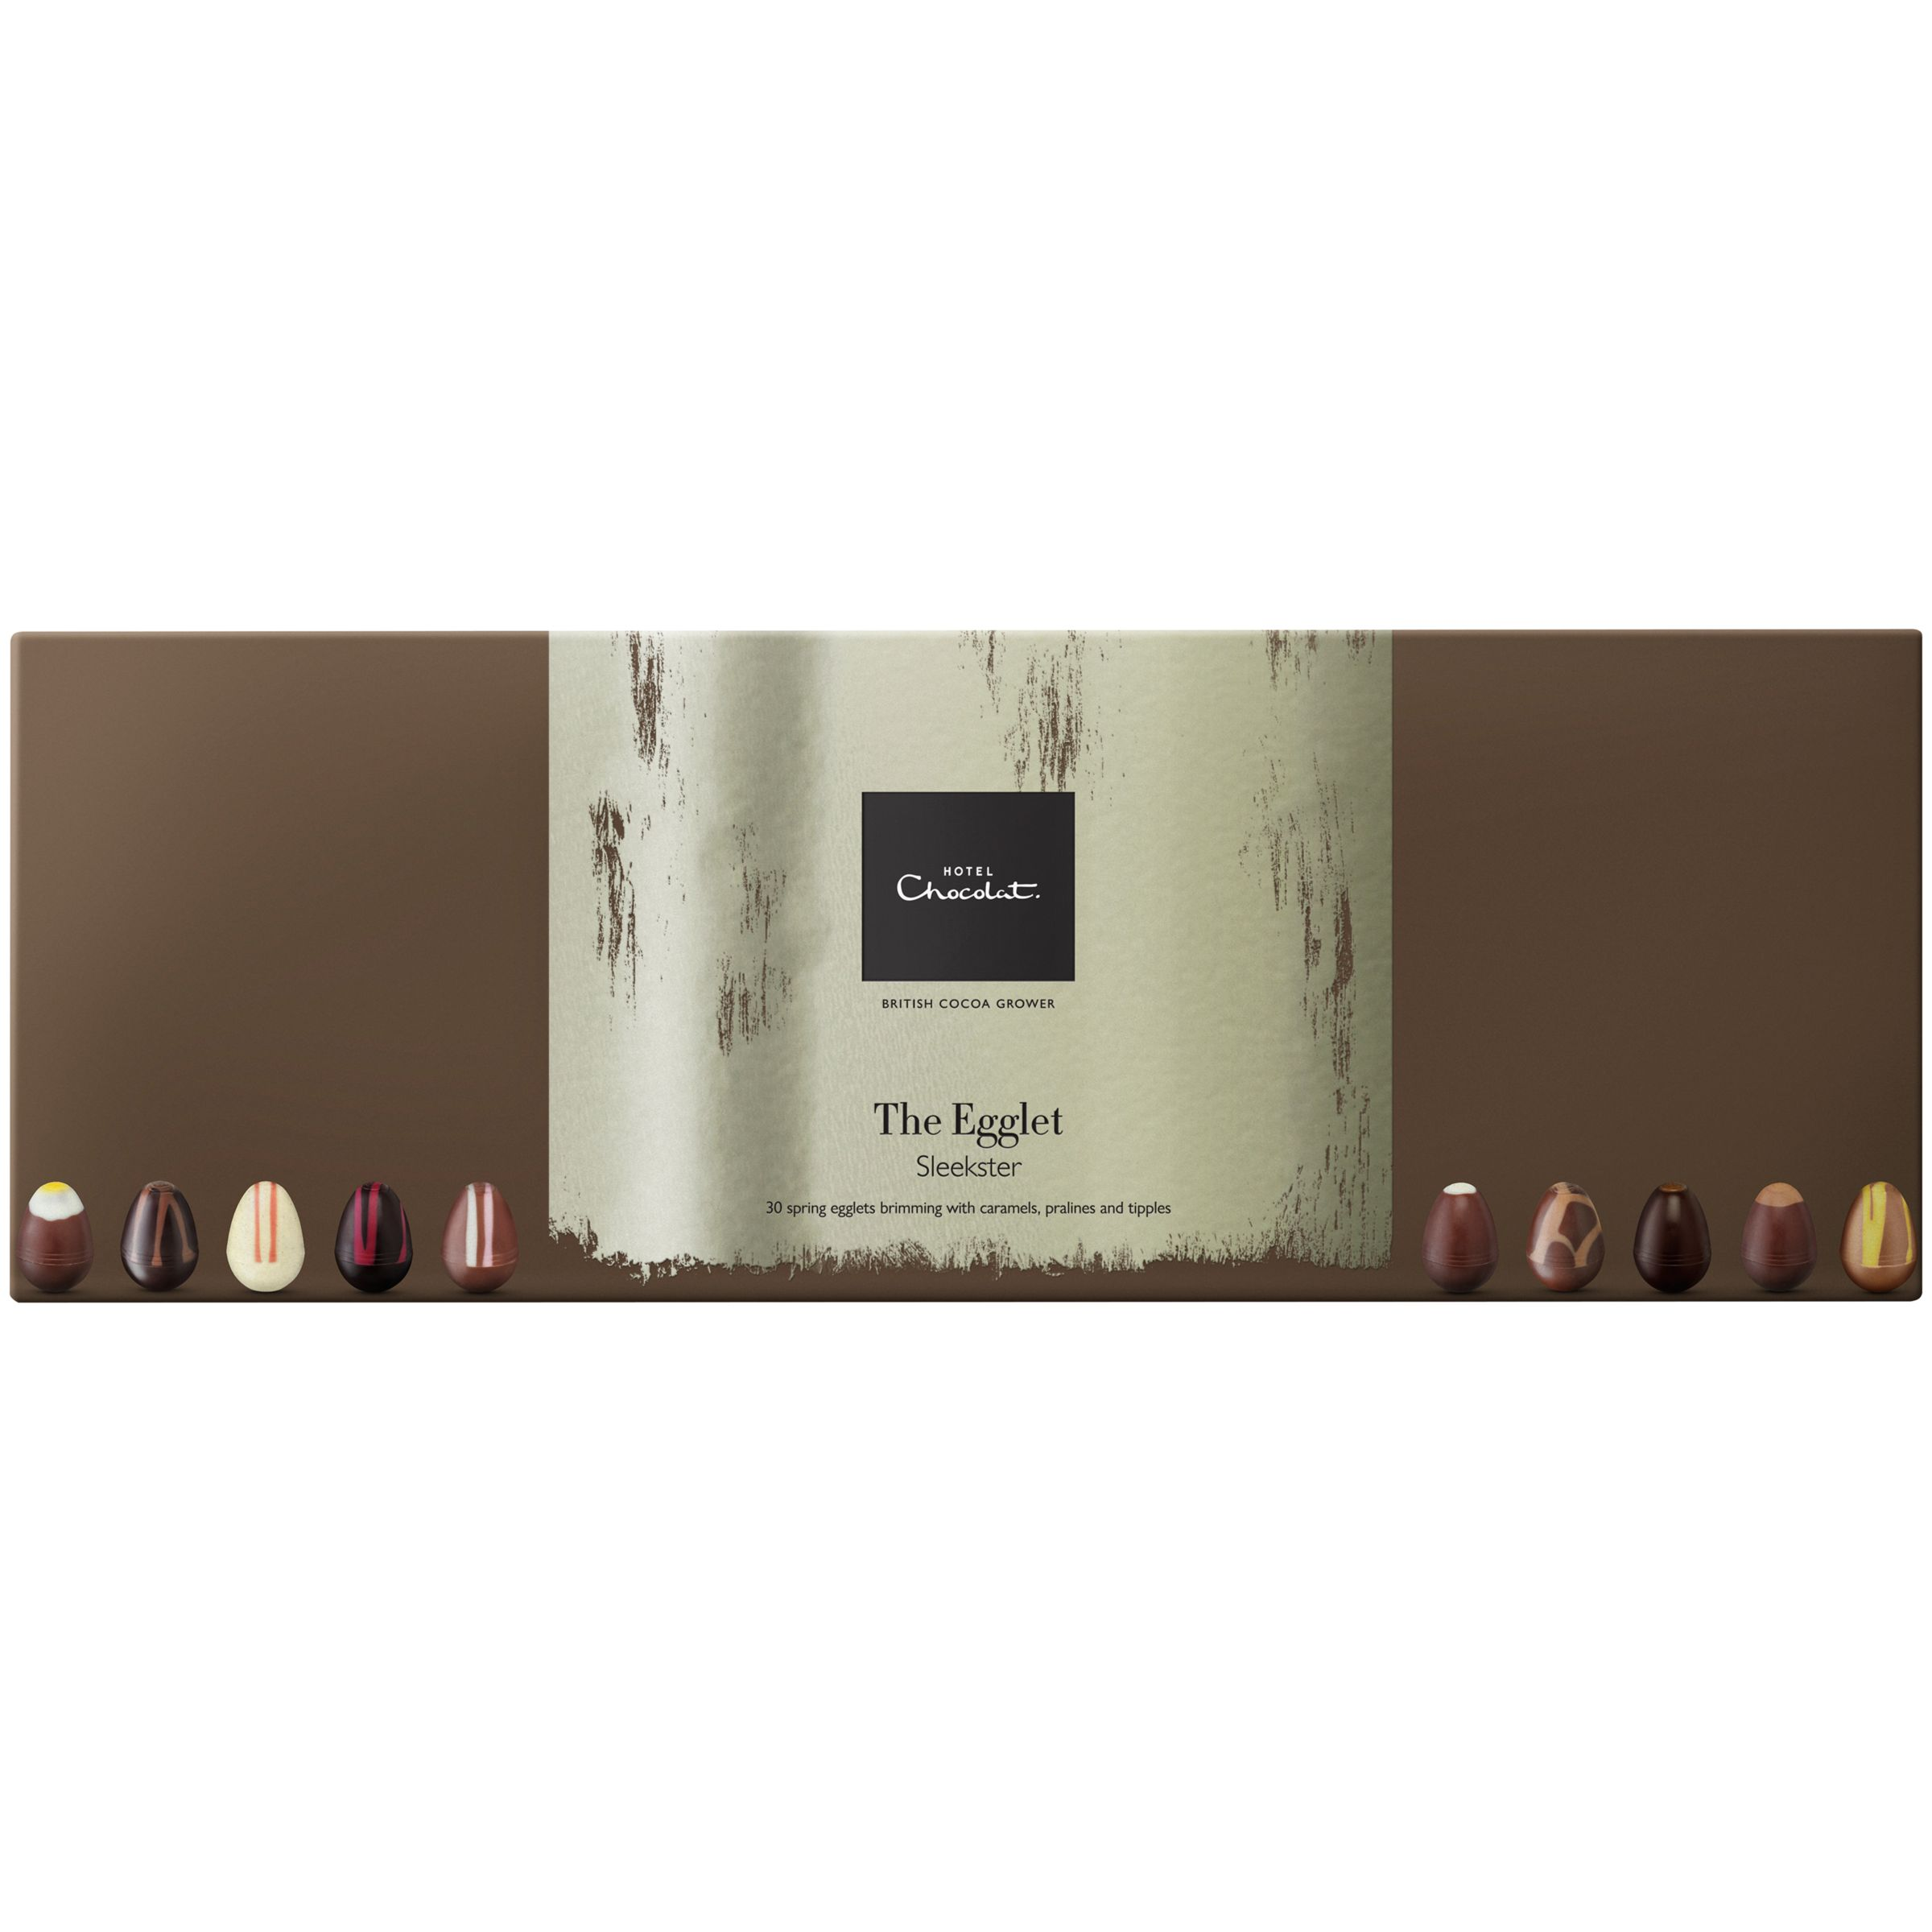 Hotel Chocolat Hotel Chocolat 'Egglet Sleekster', Box of 30, 365g